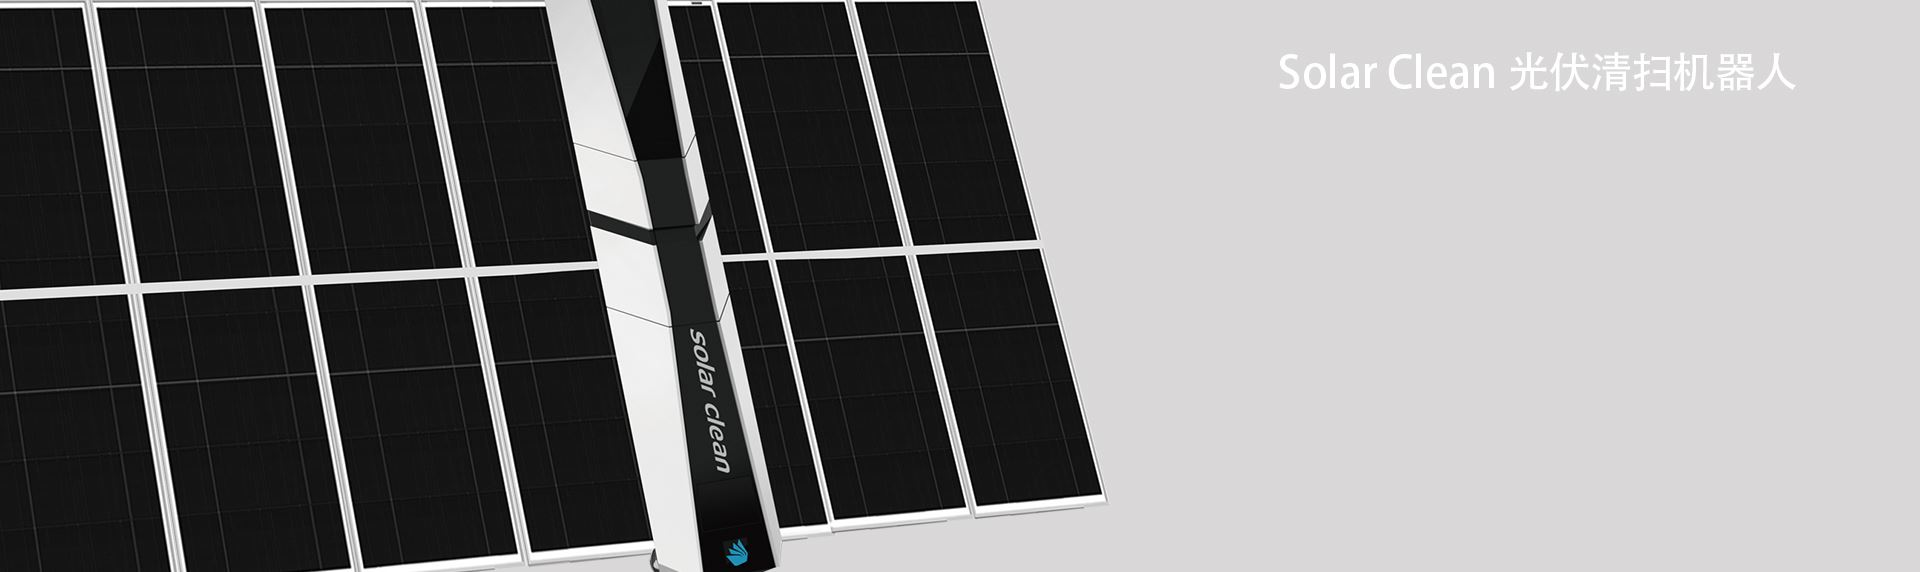 S10娱乐新闻-Solar Clean 光伏清扫机器人